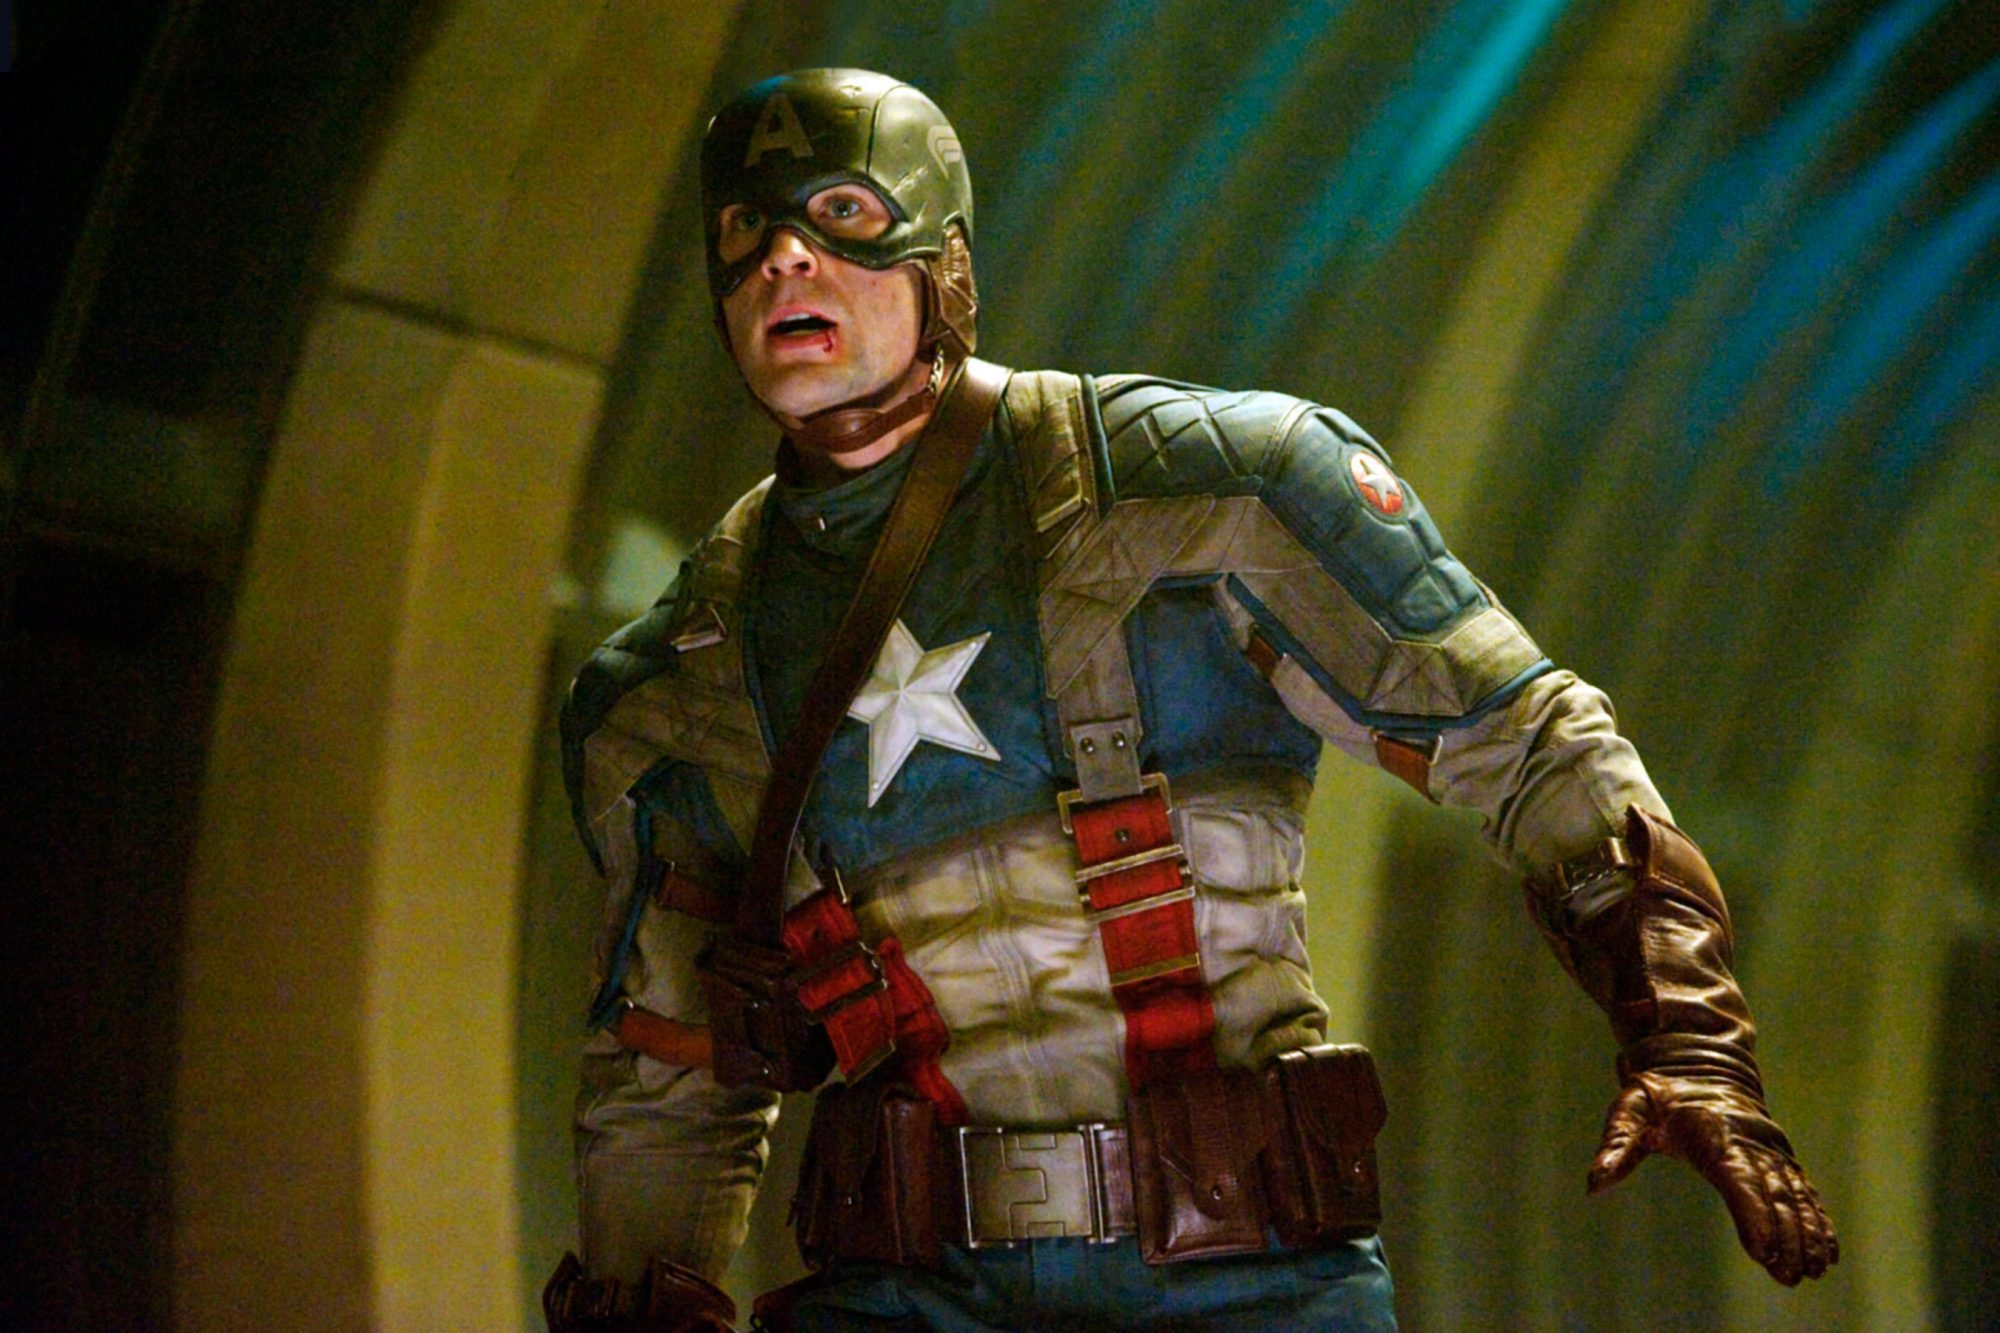 CAPTAIN AMERICA: THE FIRST AVENGER, Chris Evans, 2011. Ph: Jay Maidment/Marvel Studios–©2011 MVLFFLL